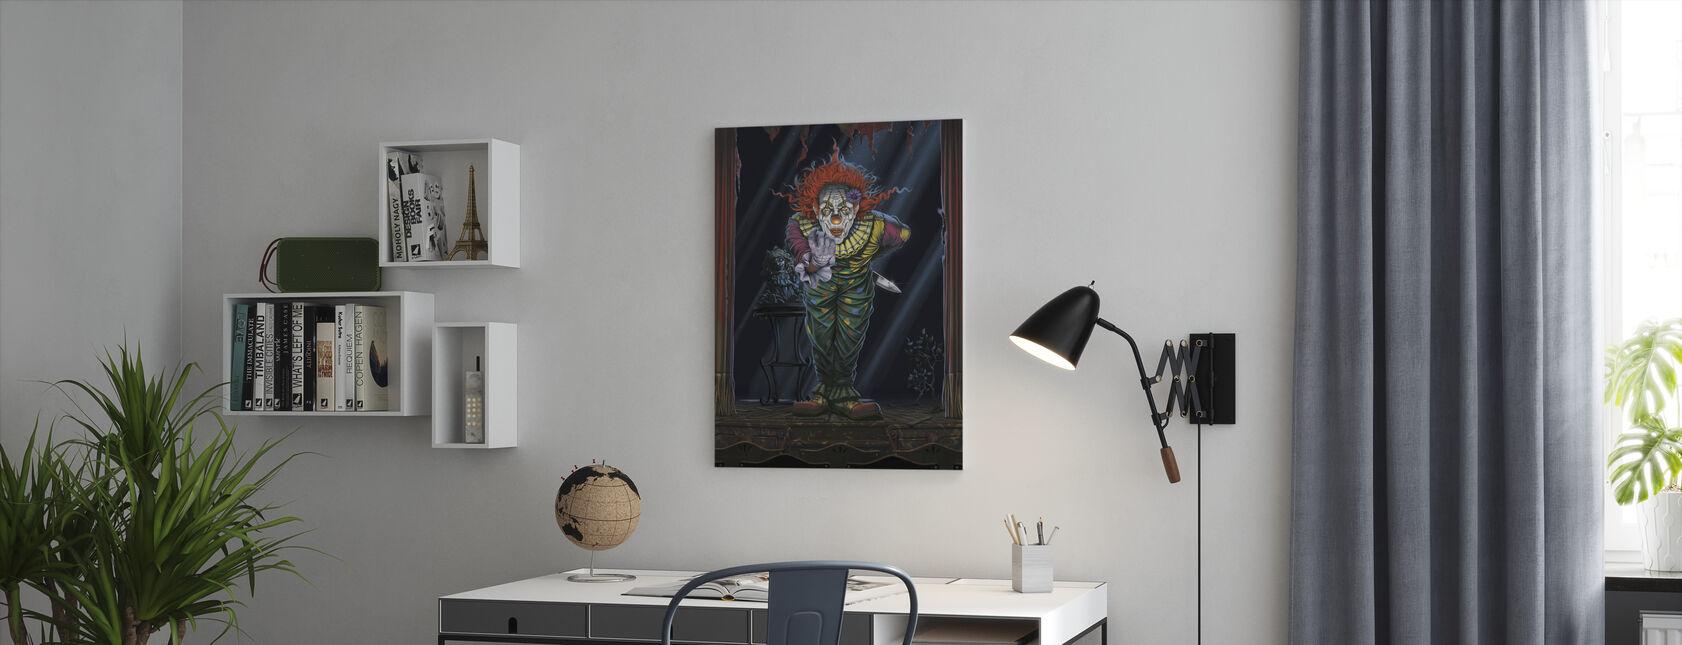 Verrassing Clown - Canvas print - Kantoor